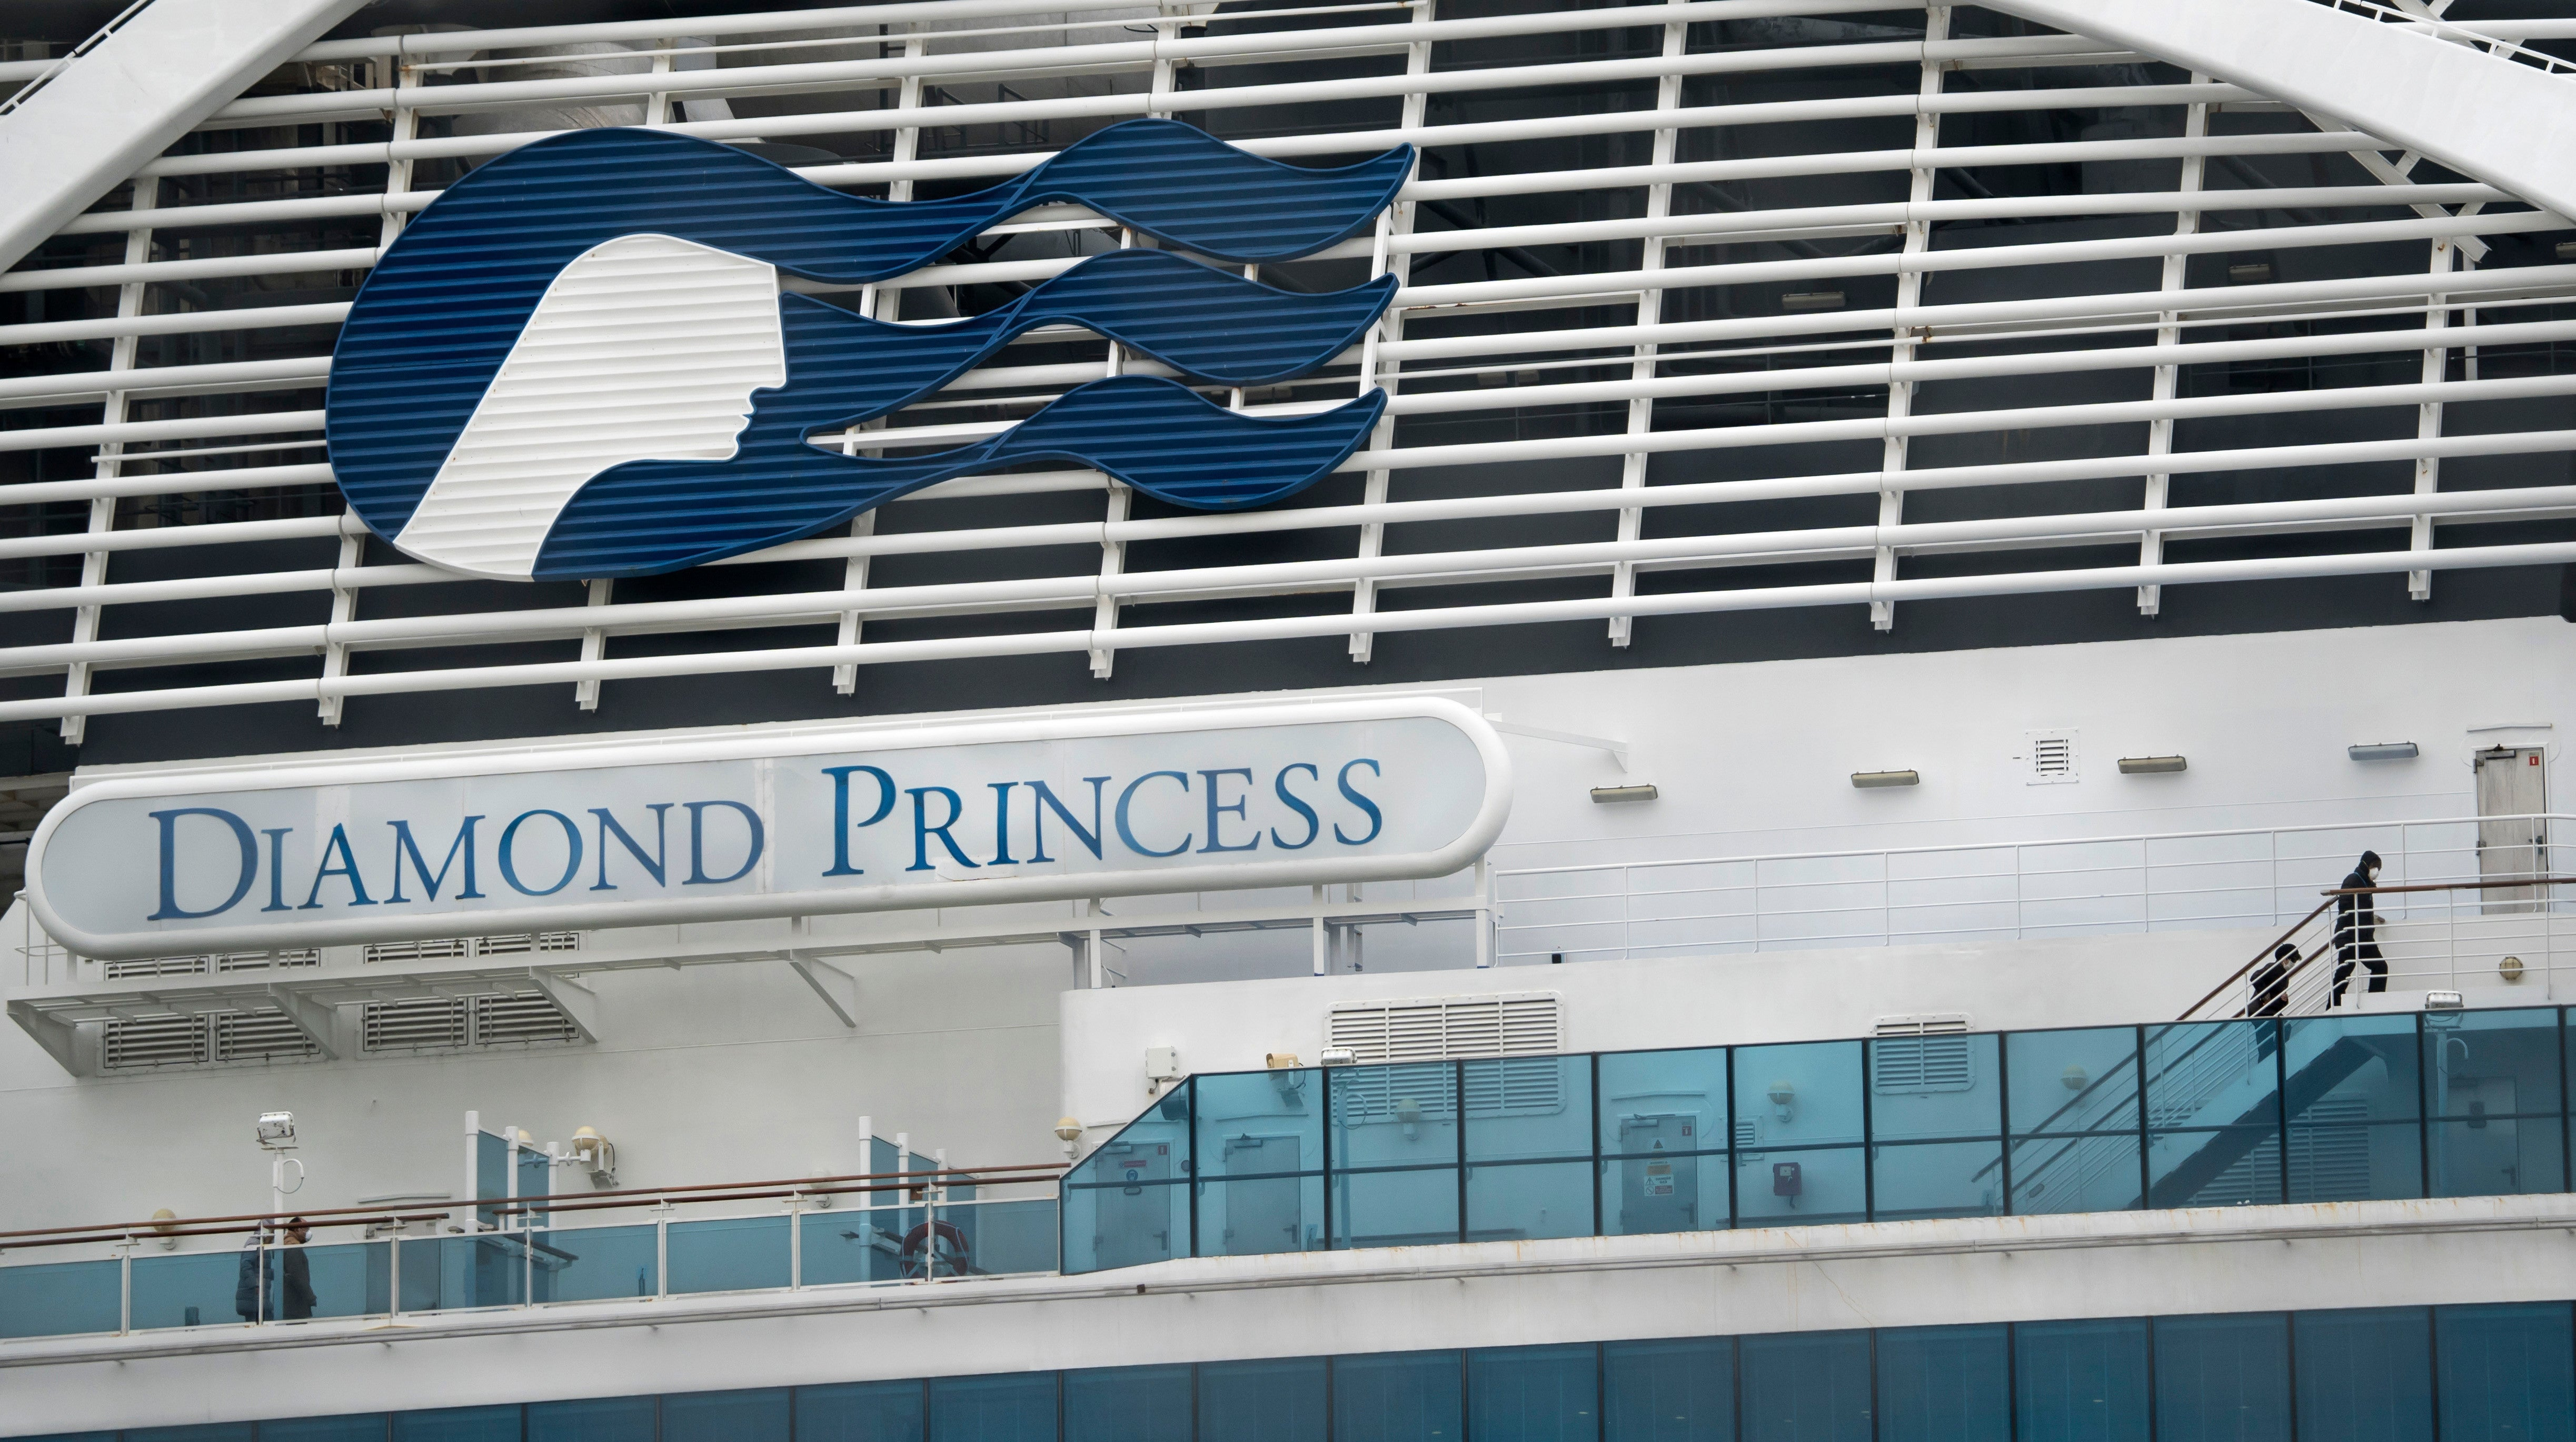 2 Cruise Ship Passengers Die Of Coronavirus, Raising Death Toll Outside China To 11